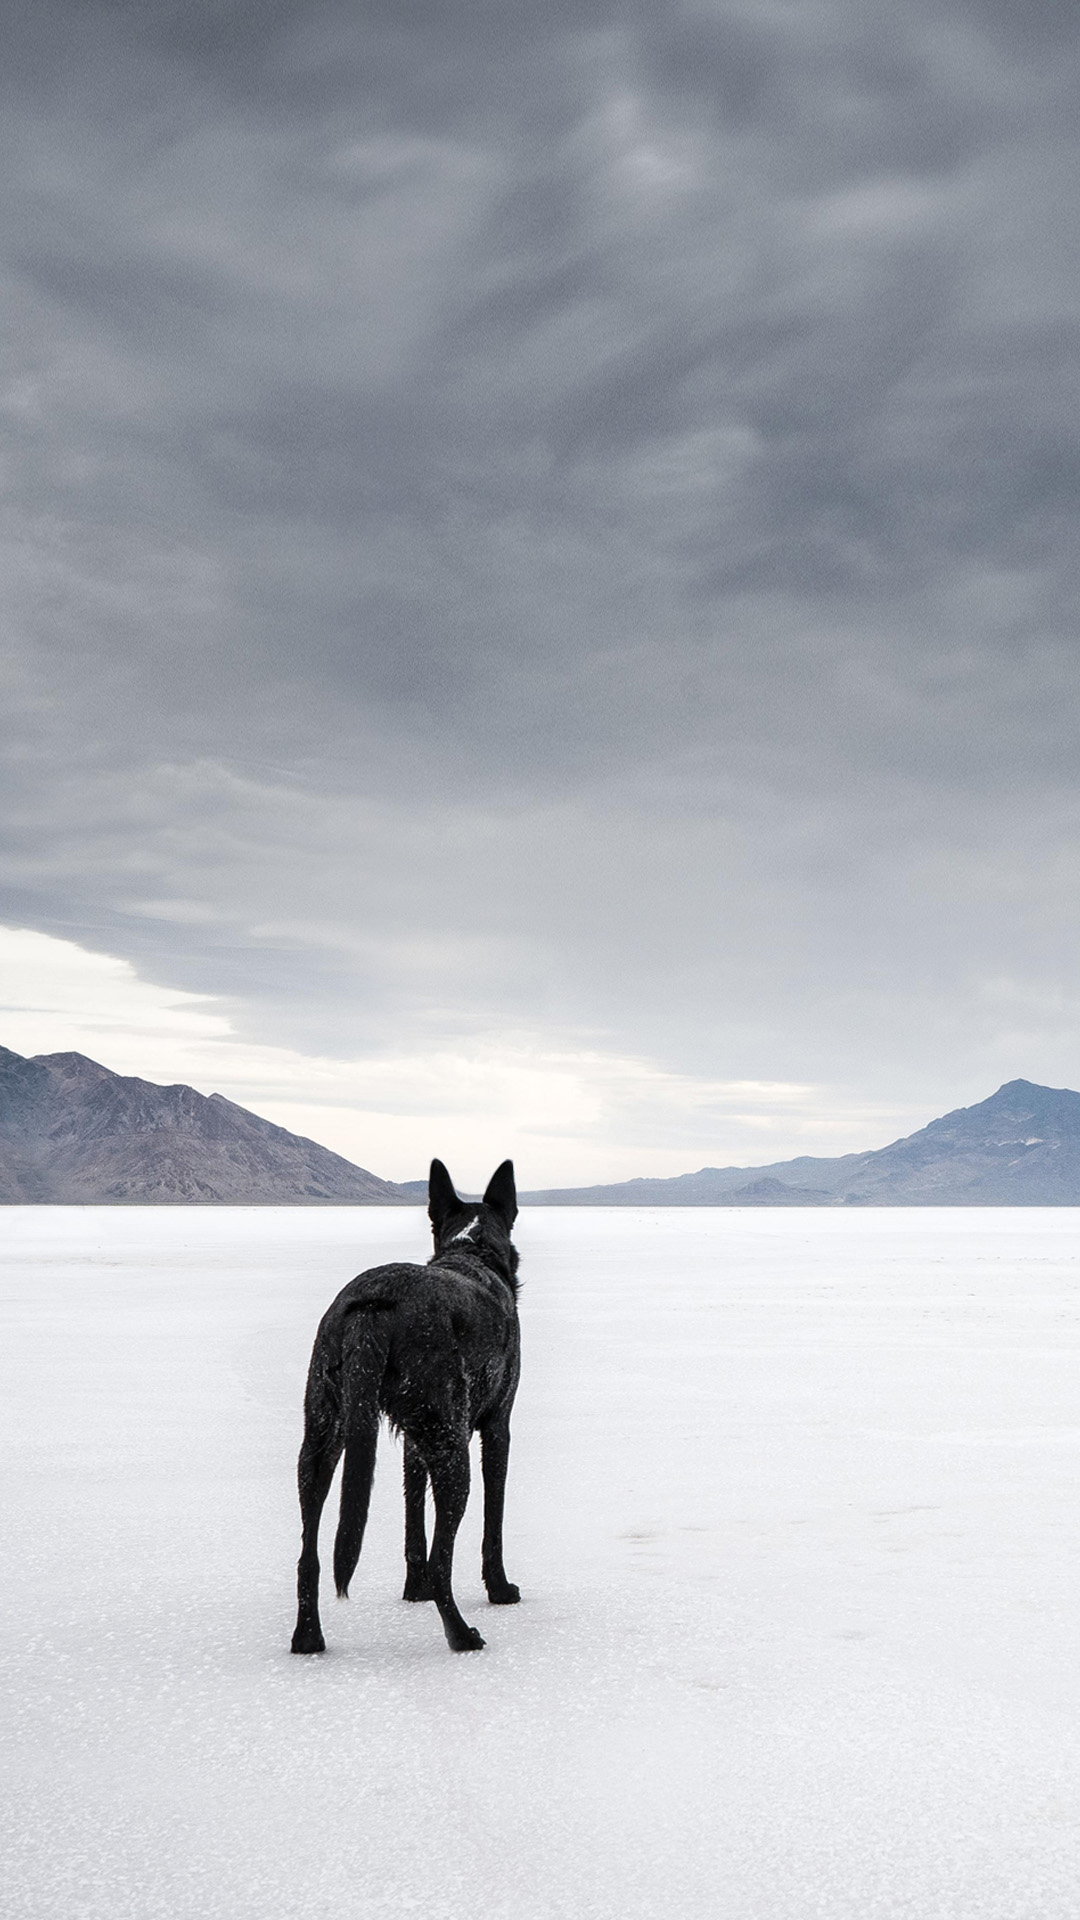 wolf 1080x1920 desktop wallpaper   android wallpapers download 1080x1920